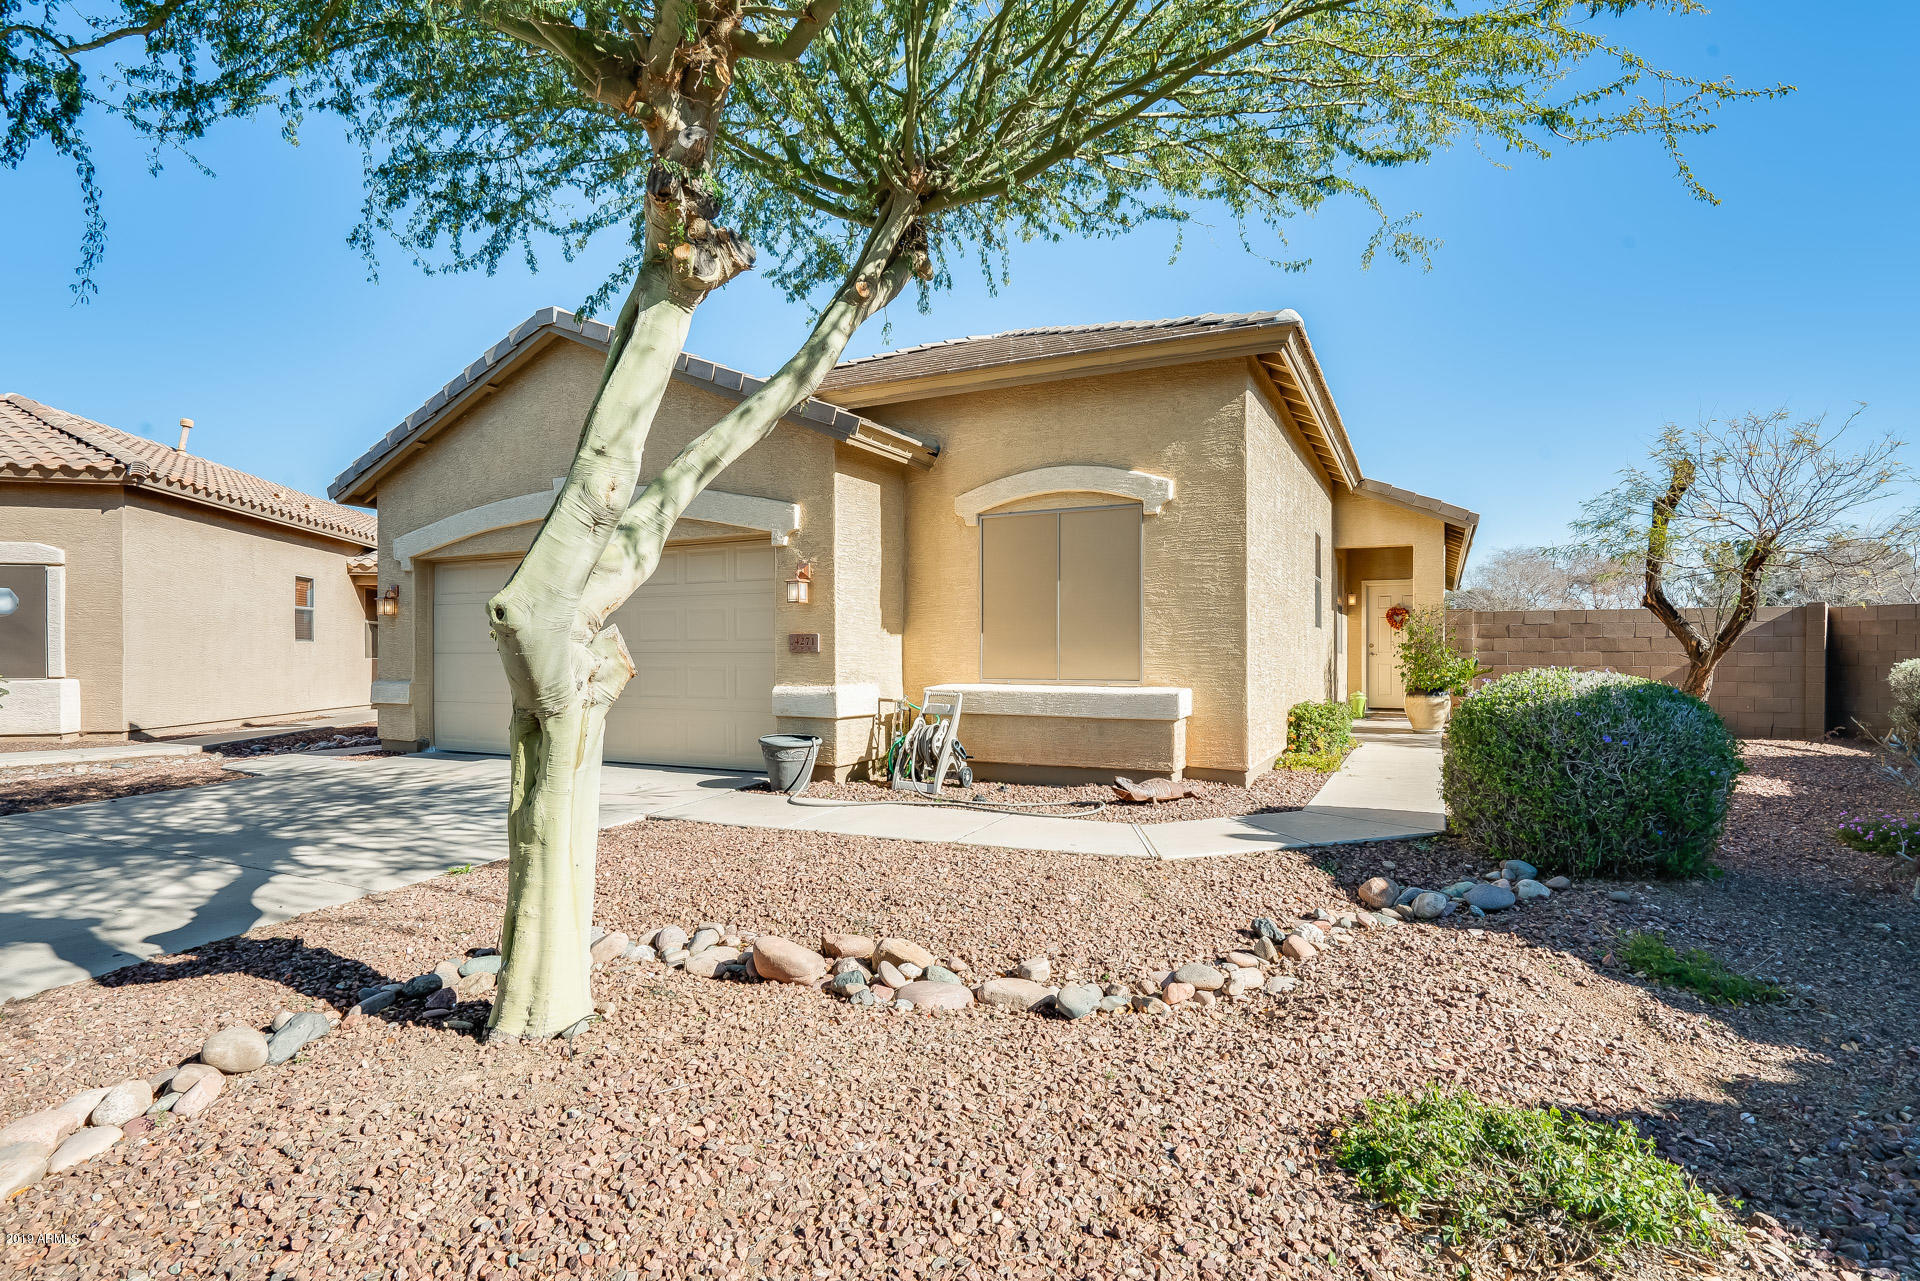 Photo of 4271 N 127TH Drive, Litchfield Park, AZ 85340